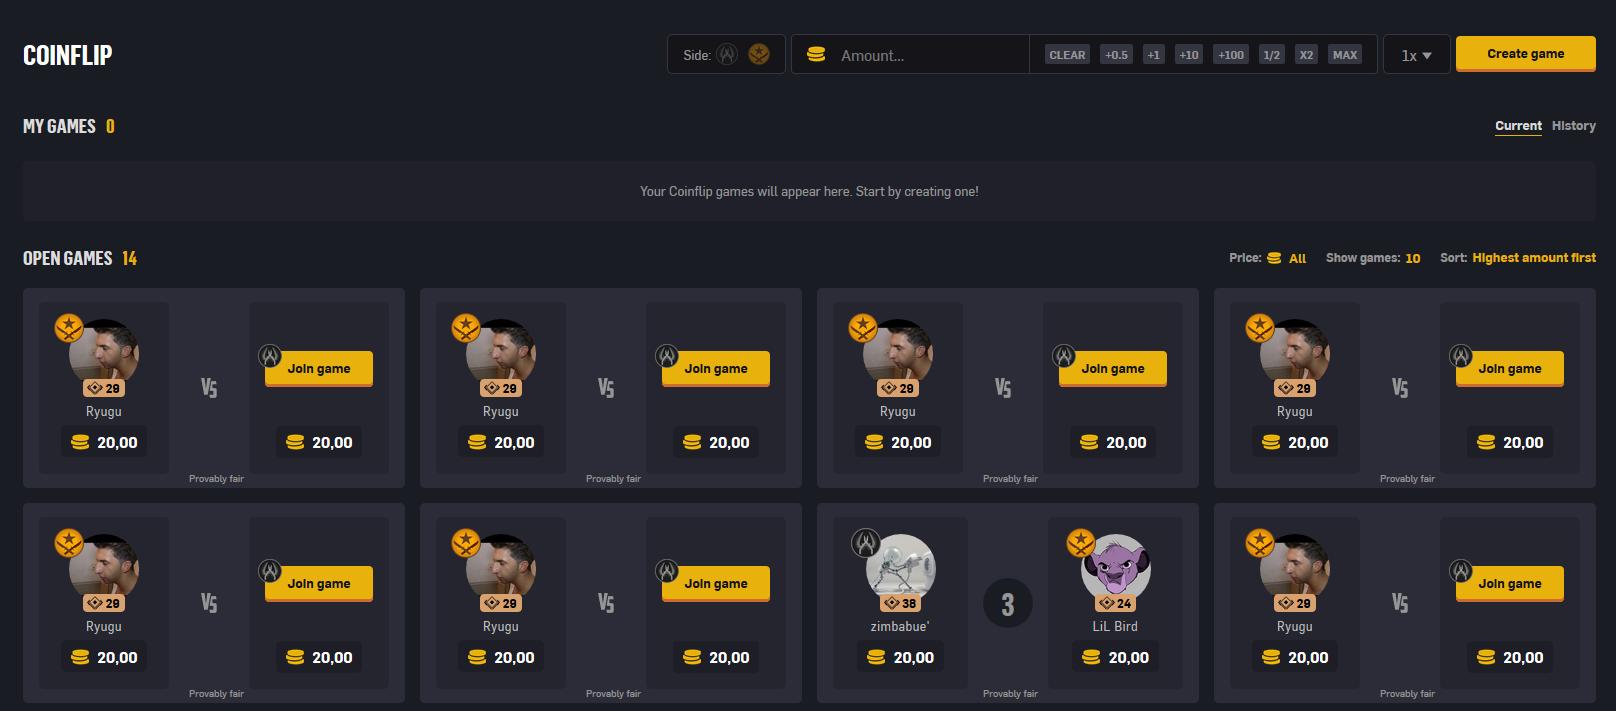 CSGO Coinflip on Gambling Site CSGOEmpire